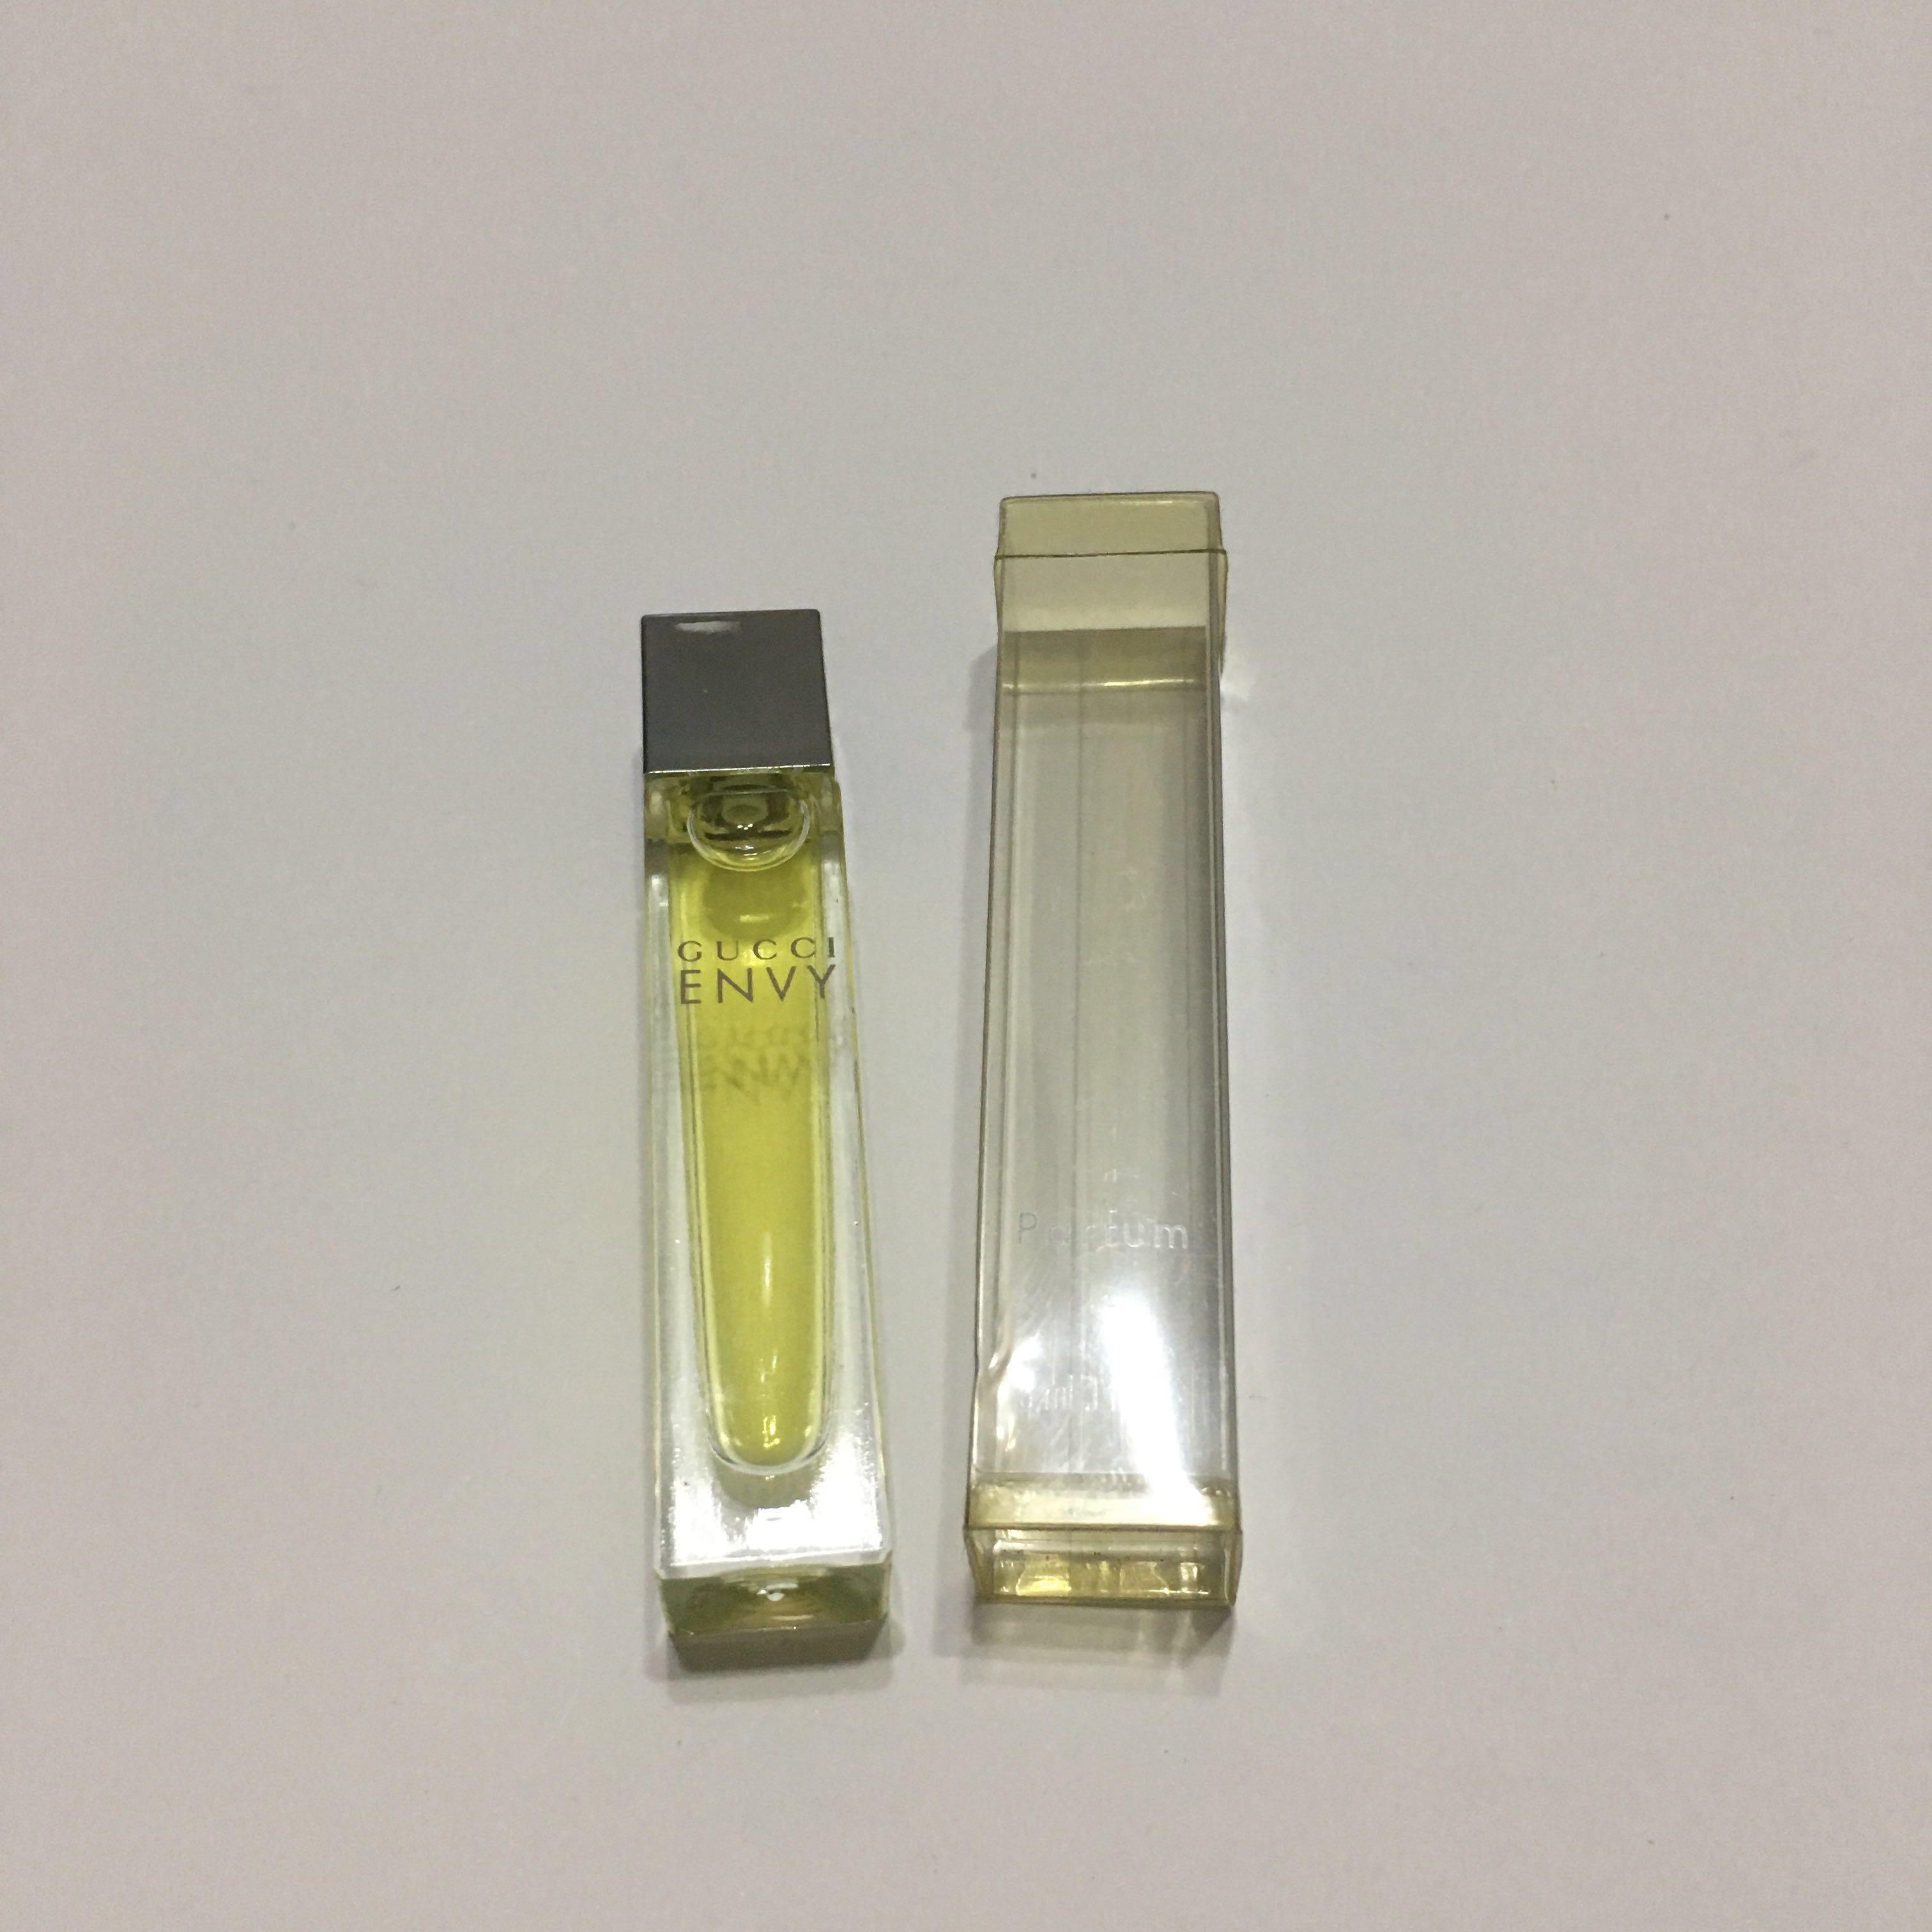 Gucci Envy Mini Perfume 3ml Not 30ml Hard To Find Health Beauty